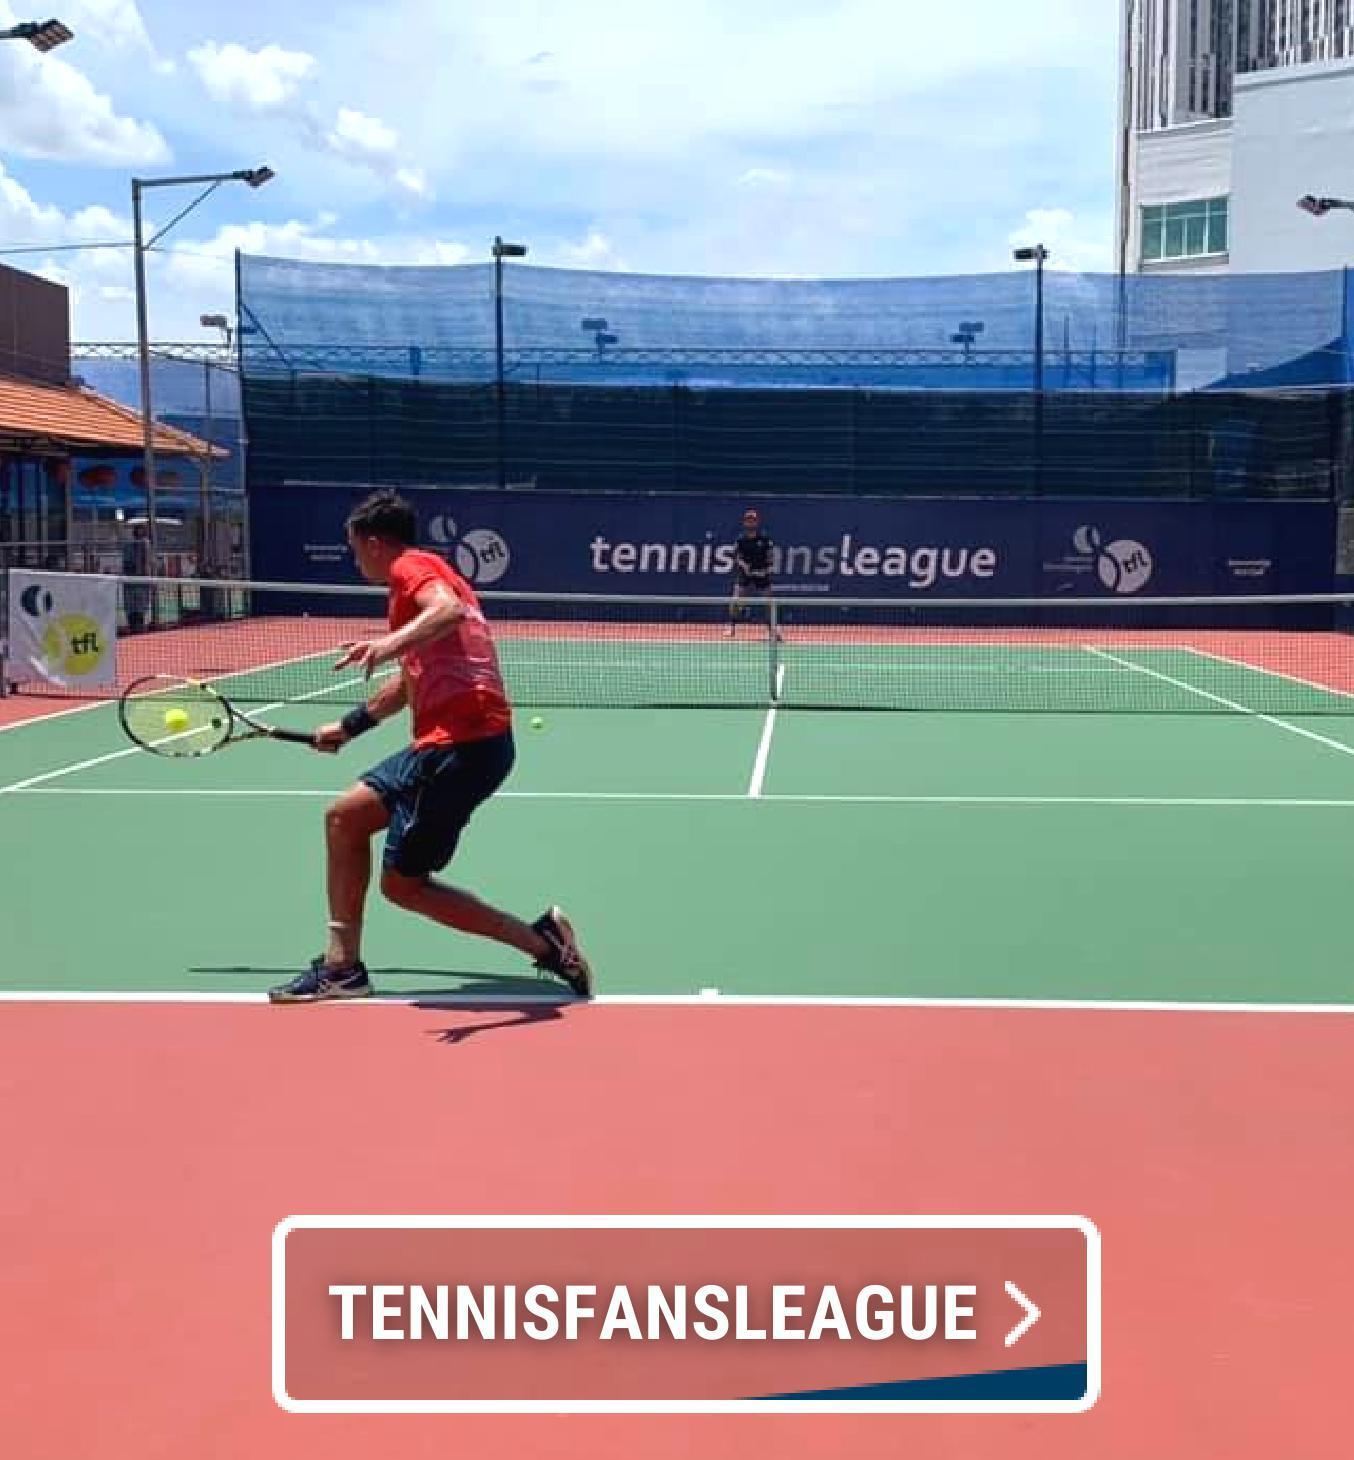 Click&collect, click and collect, đối tác giao hàng, tennisfansleague, tennis club, clb tennis quận 2